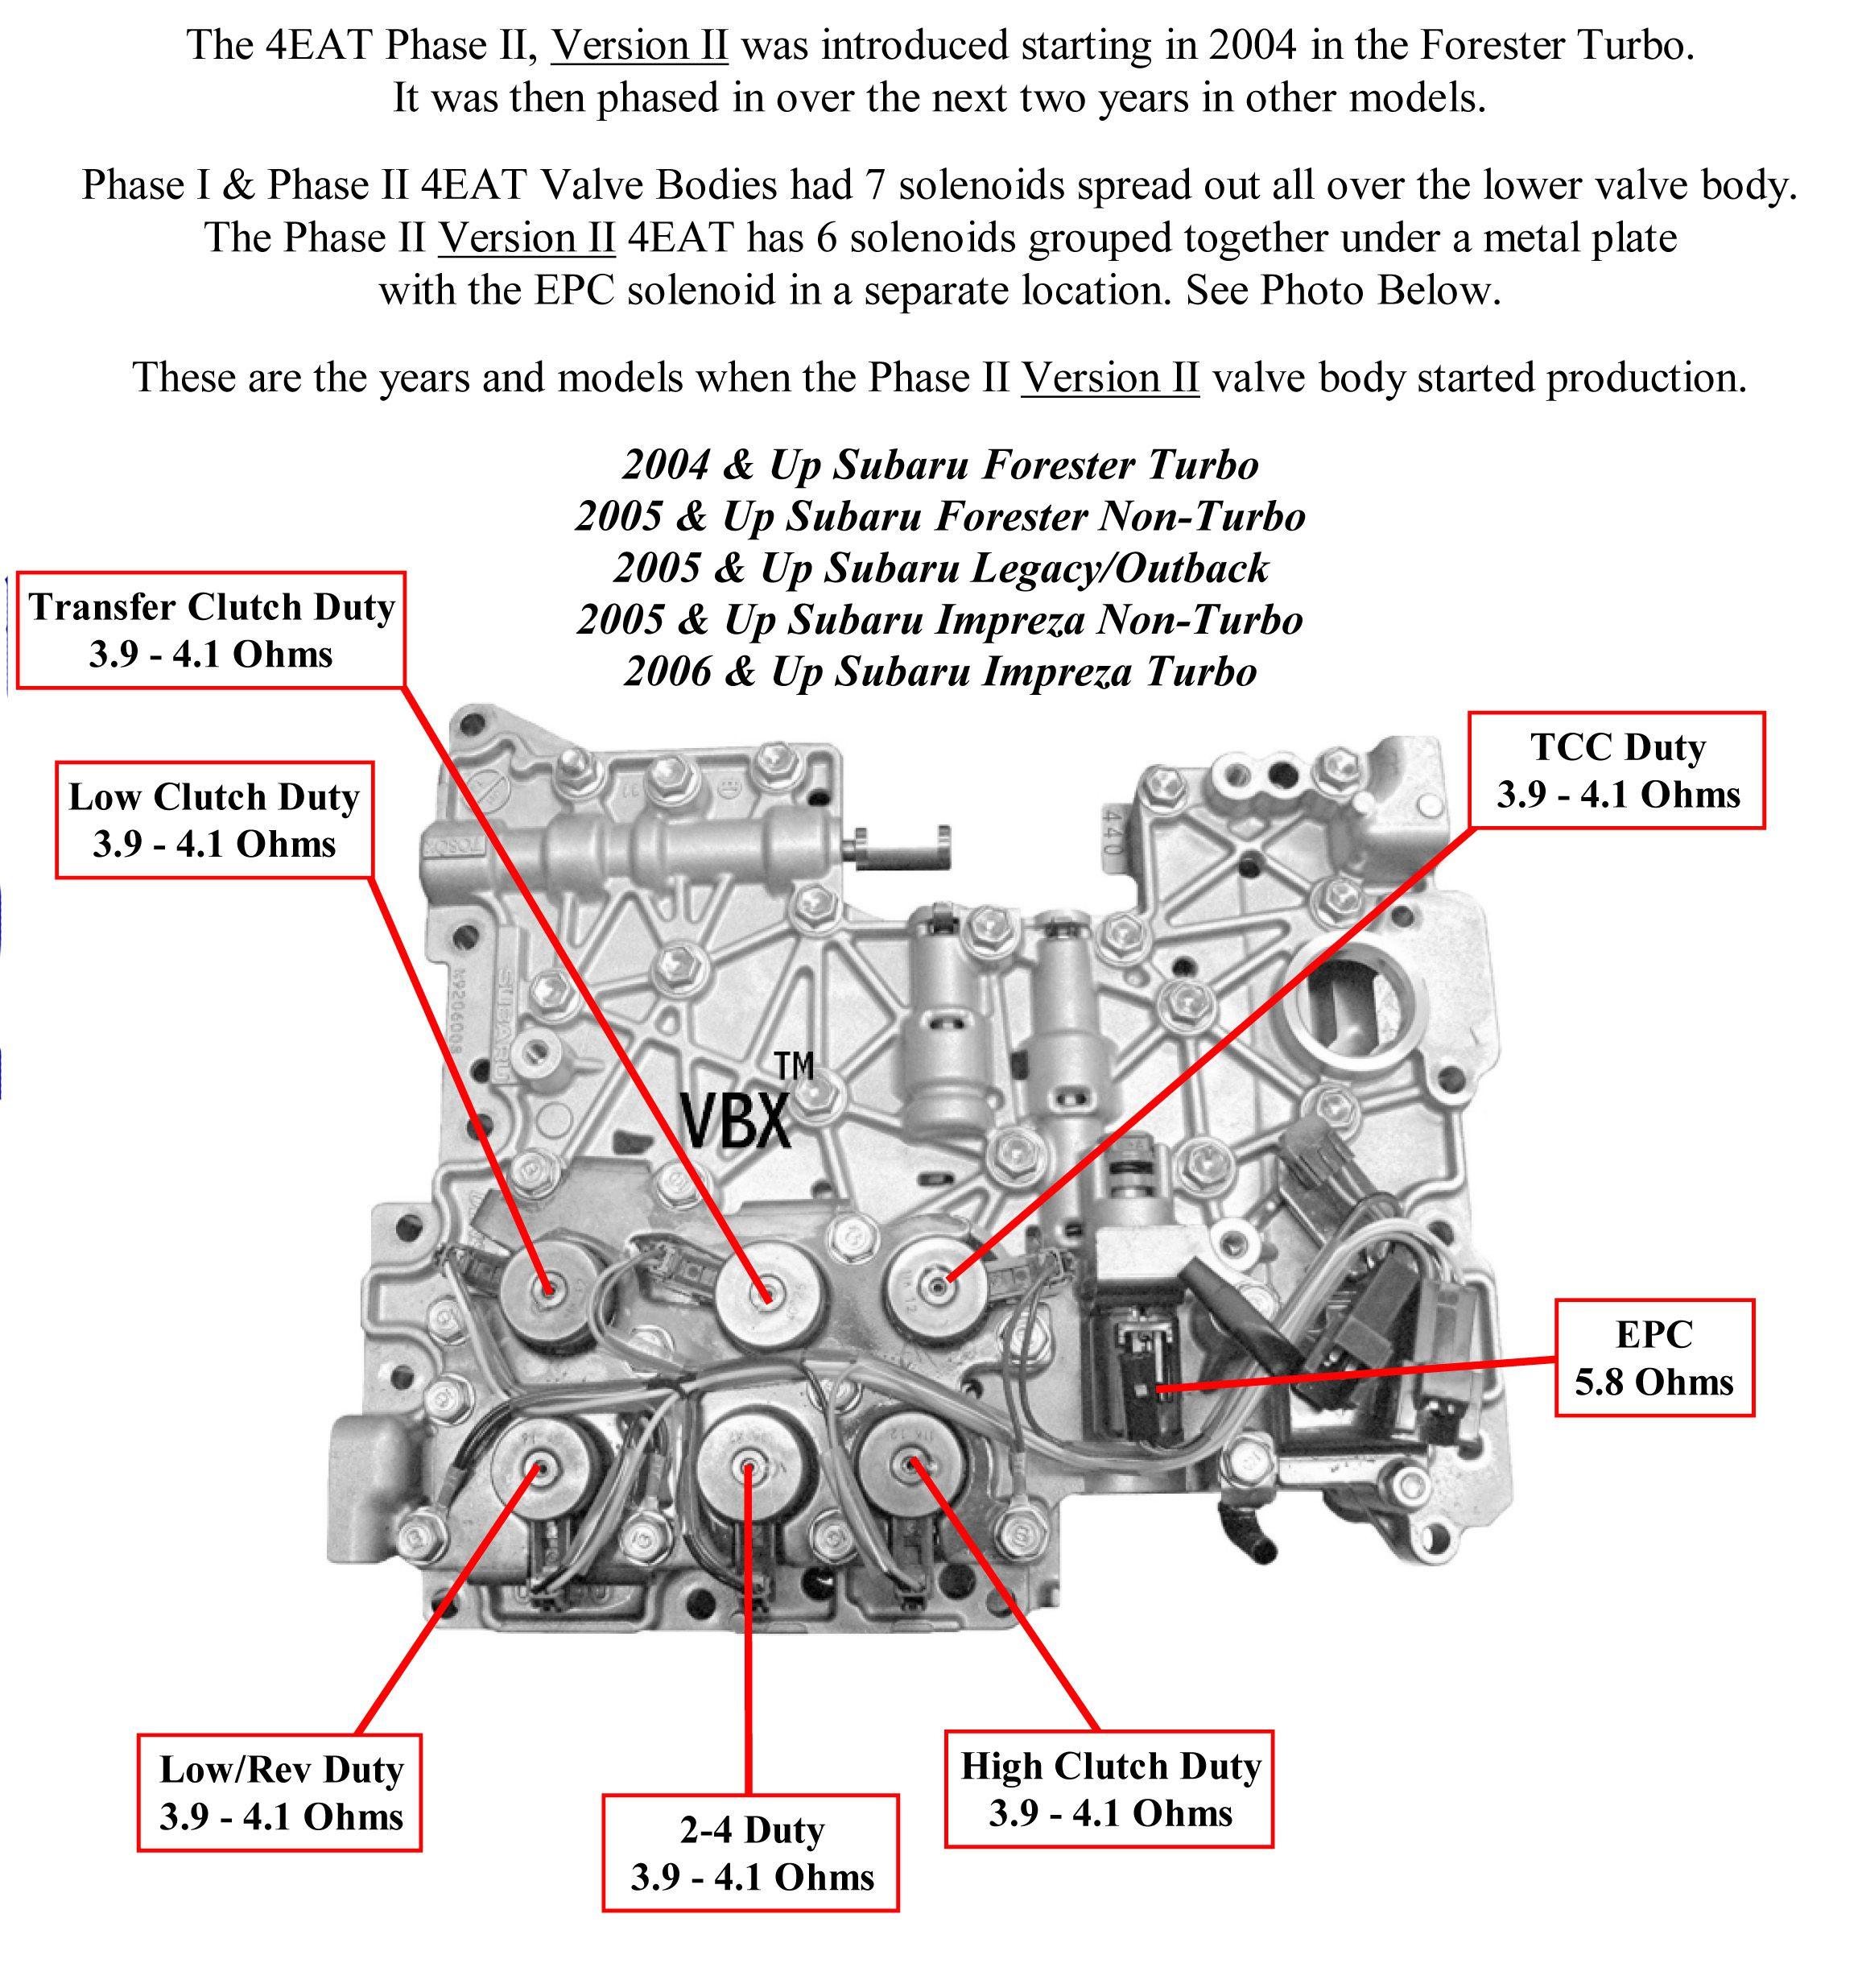 1993 Subaru 4eat Transmission Diagram Trusted Wiring Diagrams Body Smart U2022 2002 Outback Manual